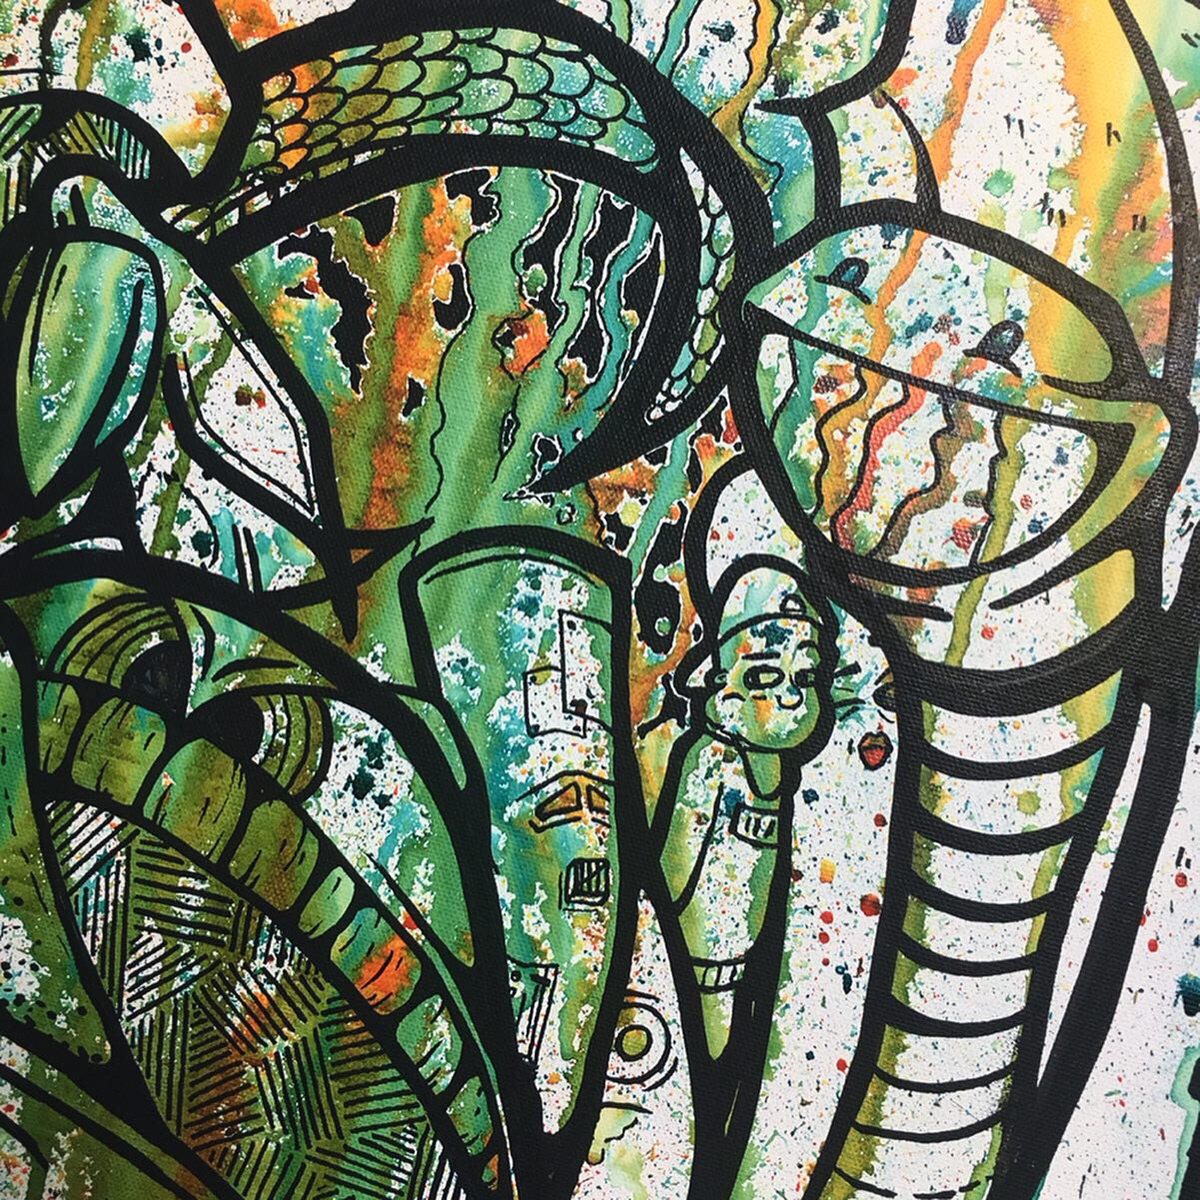 water gun experimental colors drips characters cloud contemporary art